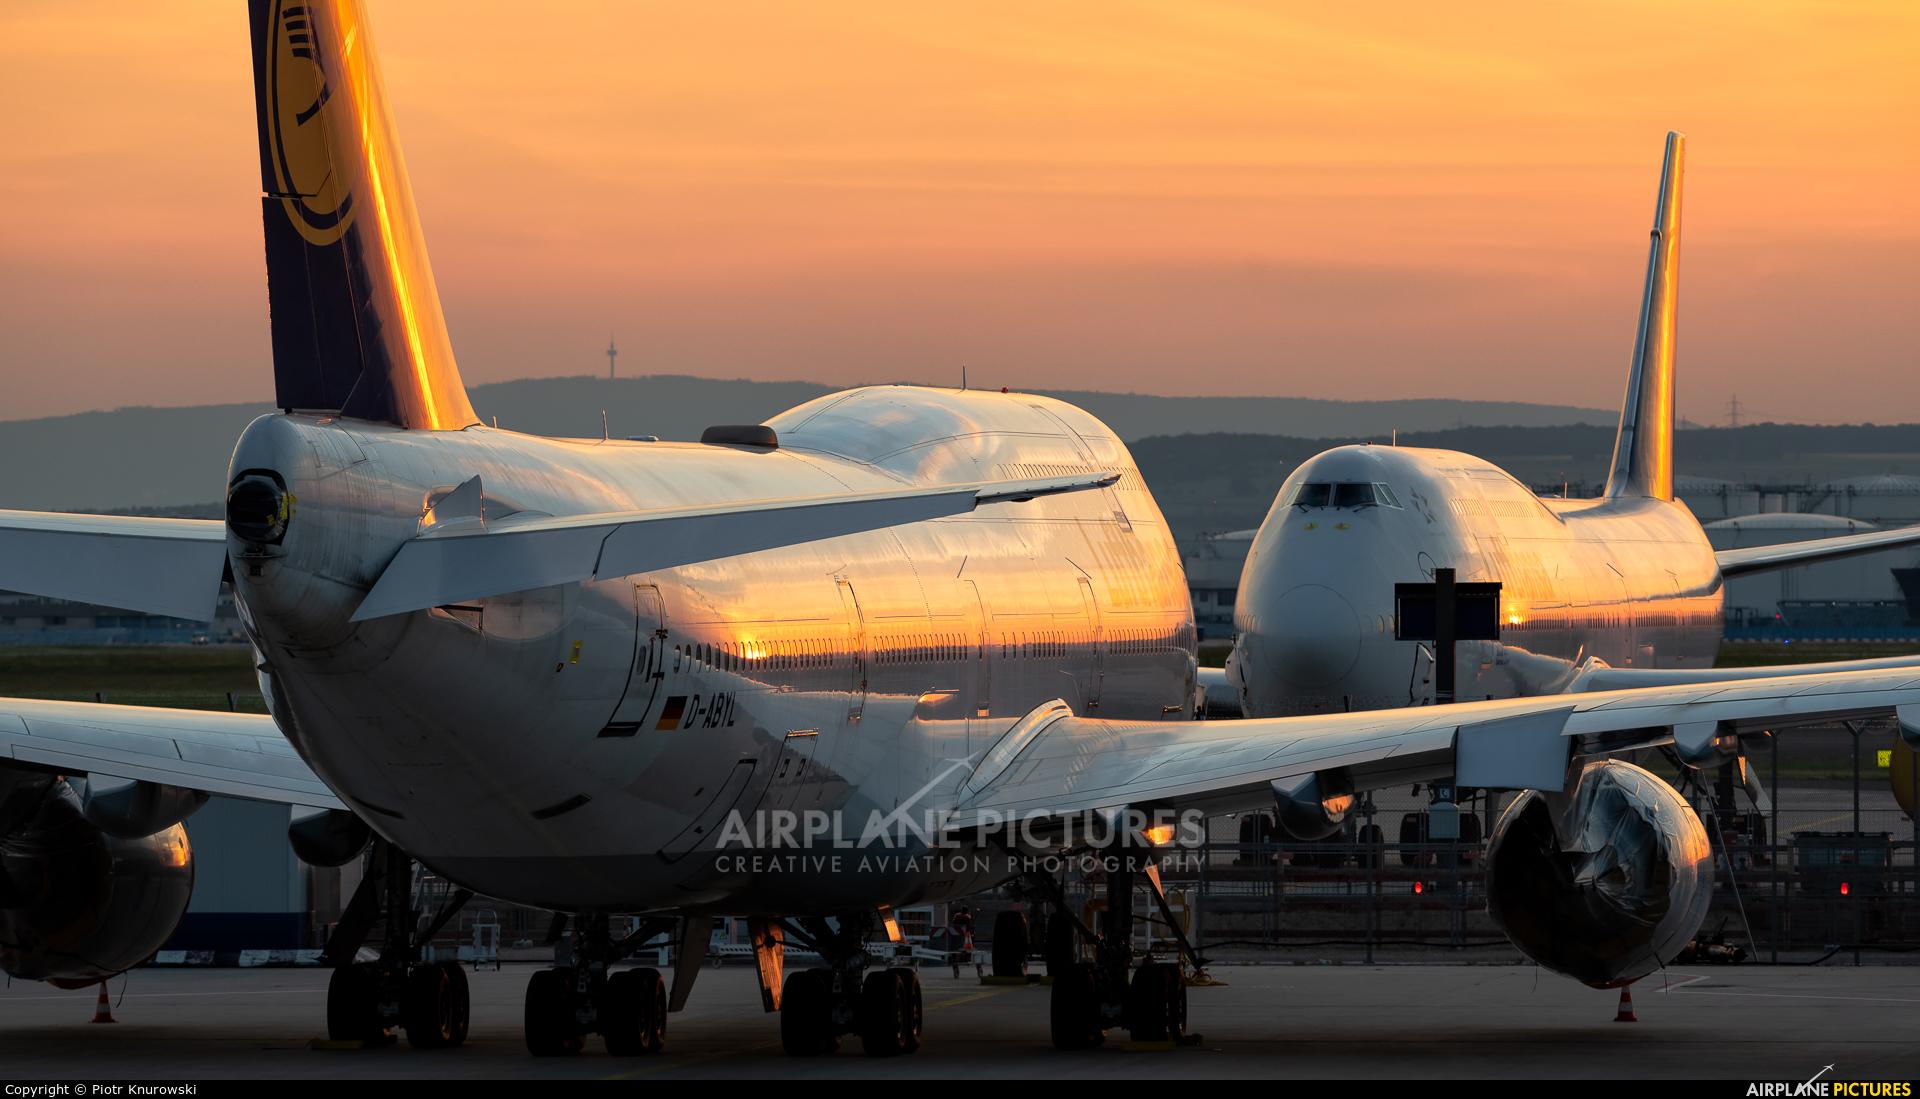 Lufthansa D-ABYL aircraft at Frankfurt